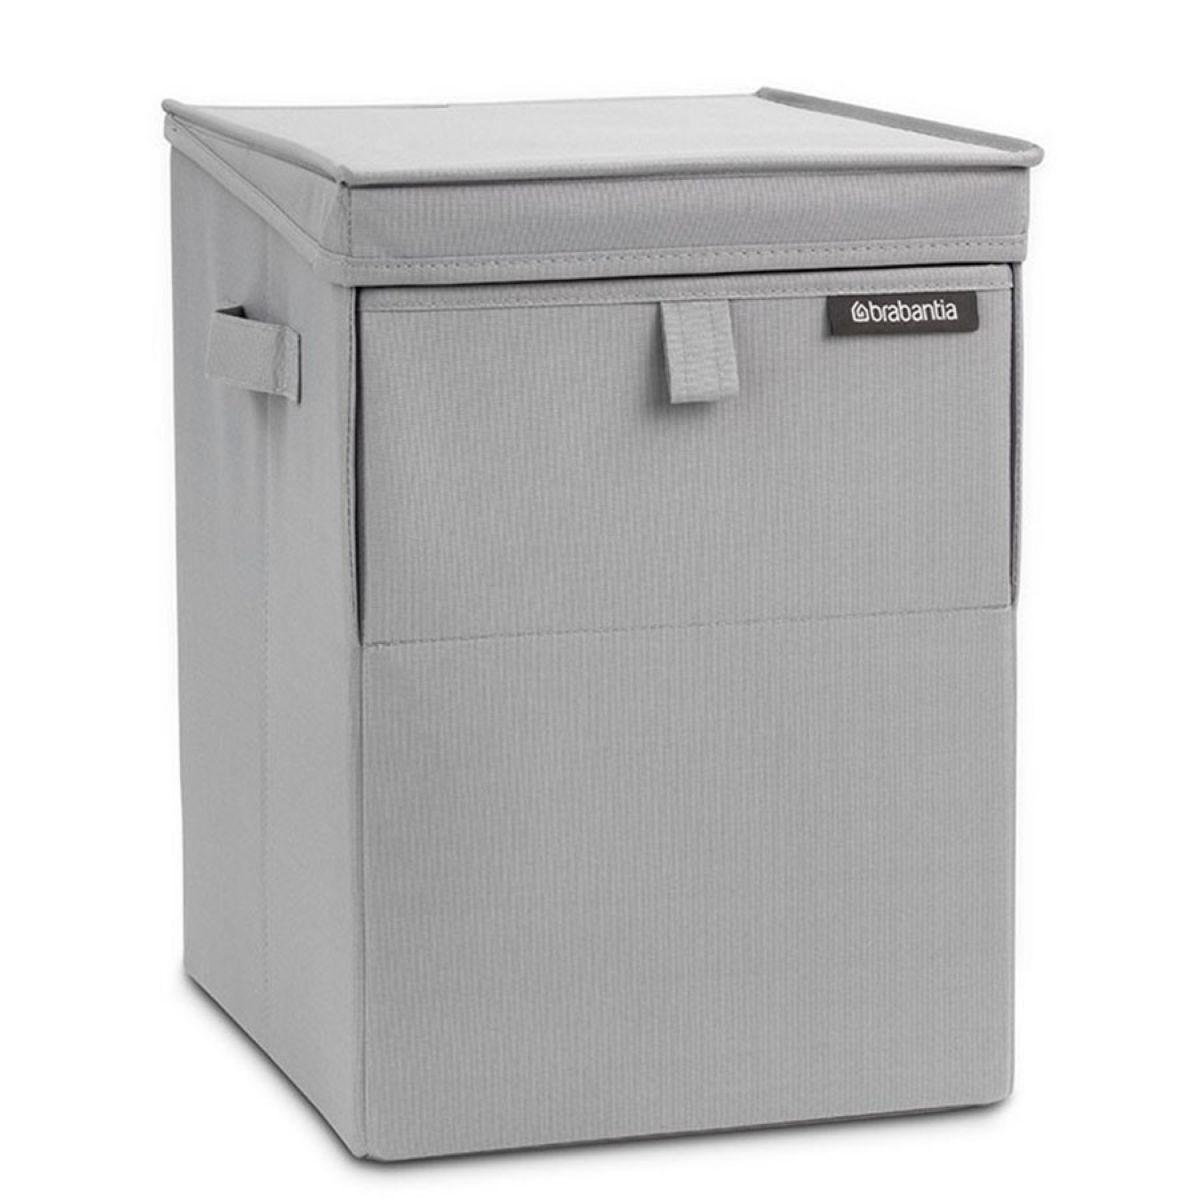 Brabantia 35L Stackable Laundry Box - Grey